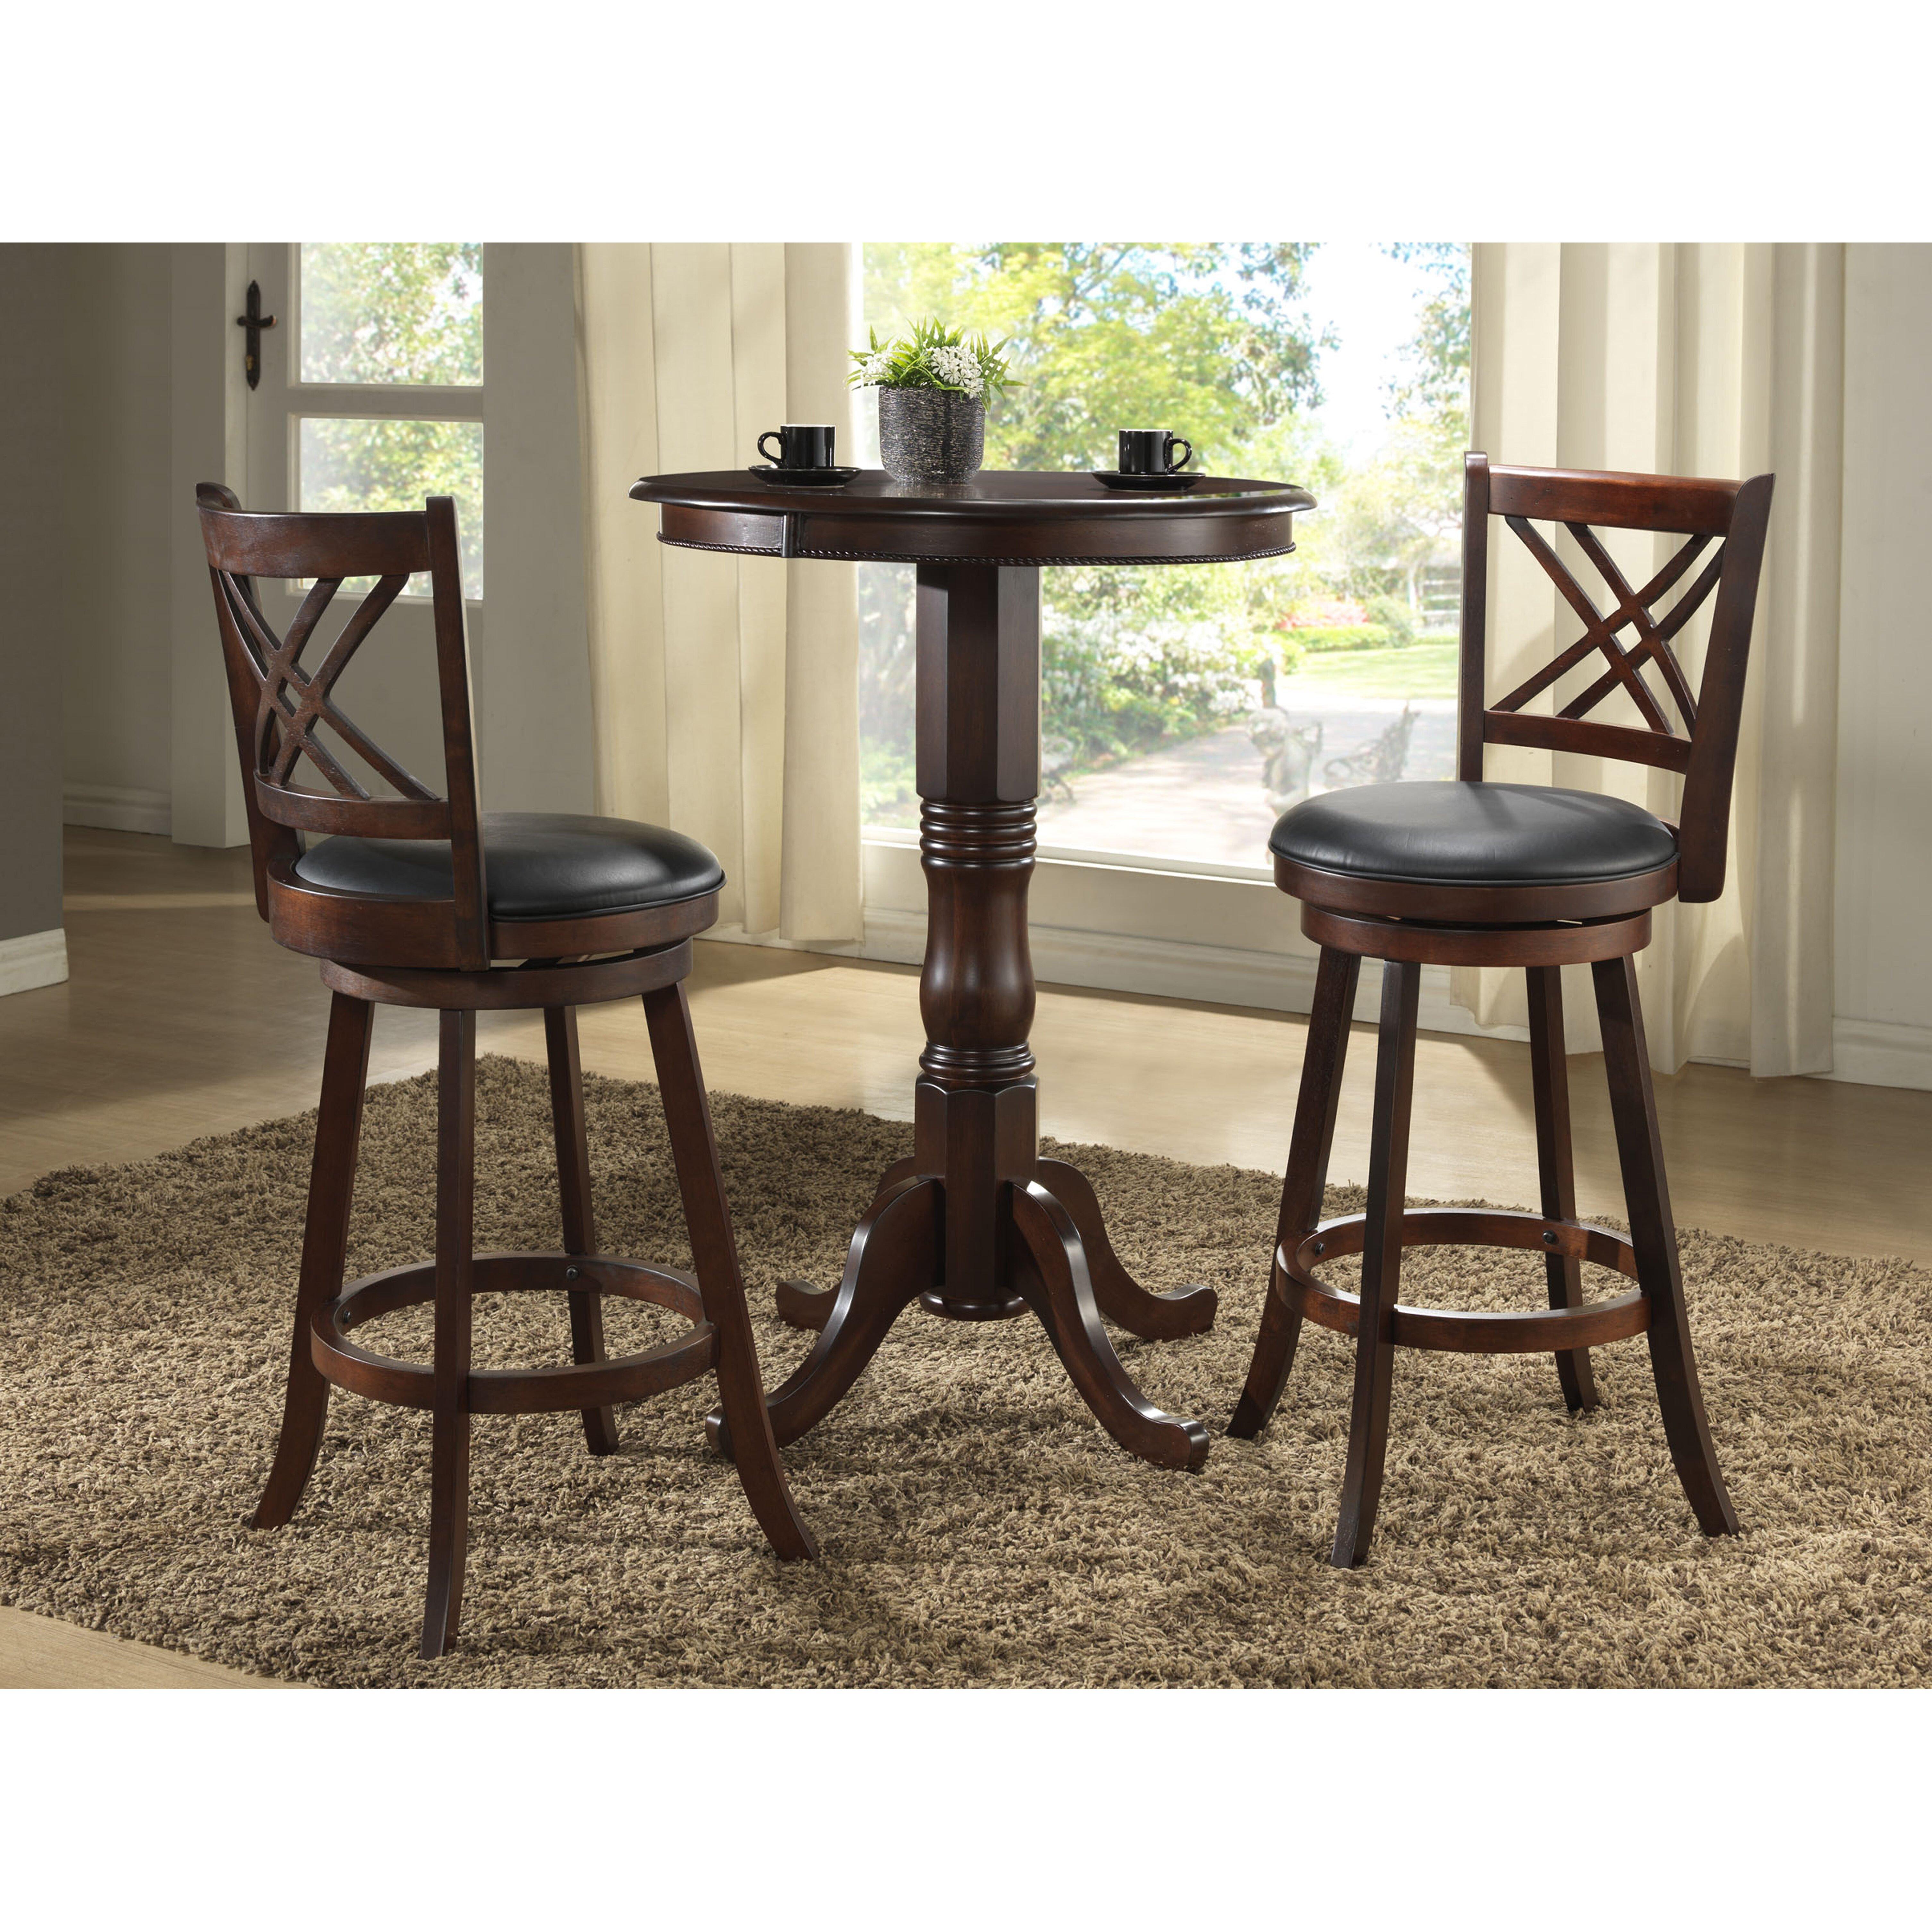 Eci Furniture Distressed 29 Swivel Bar Stool Reviews Wayfair